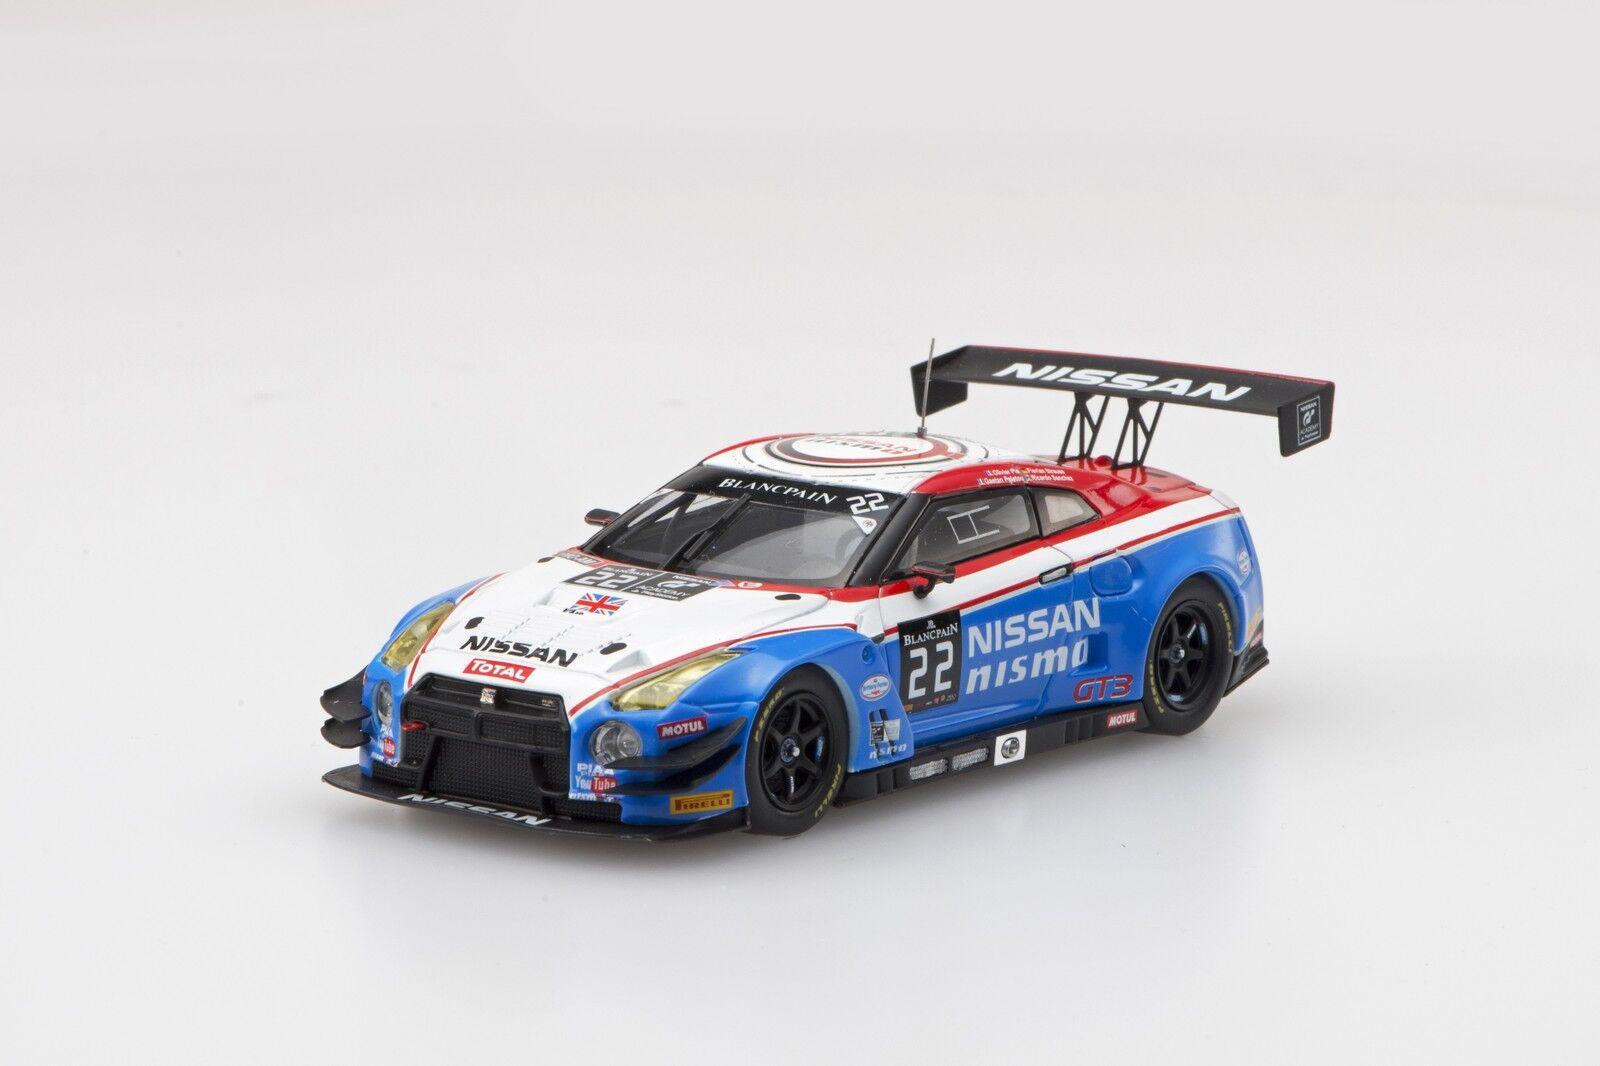 EBBRO 45482 1 43 Nissan GT-R Nismo GT 3 whitepain Endurance 2015 22 White bluee